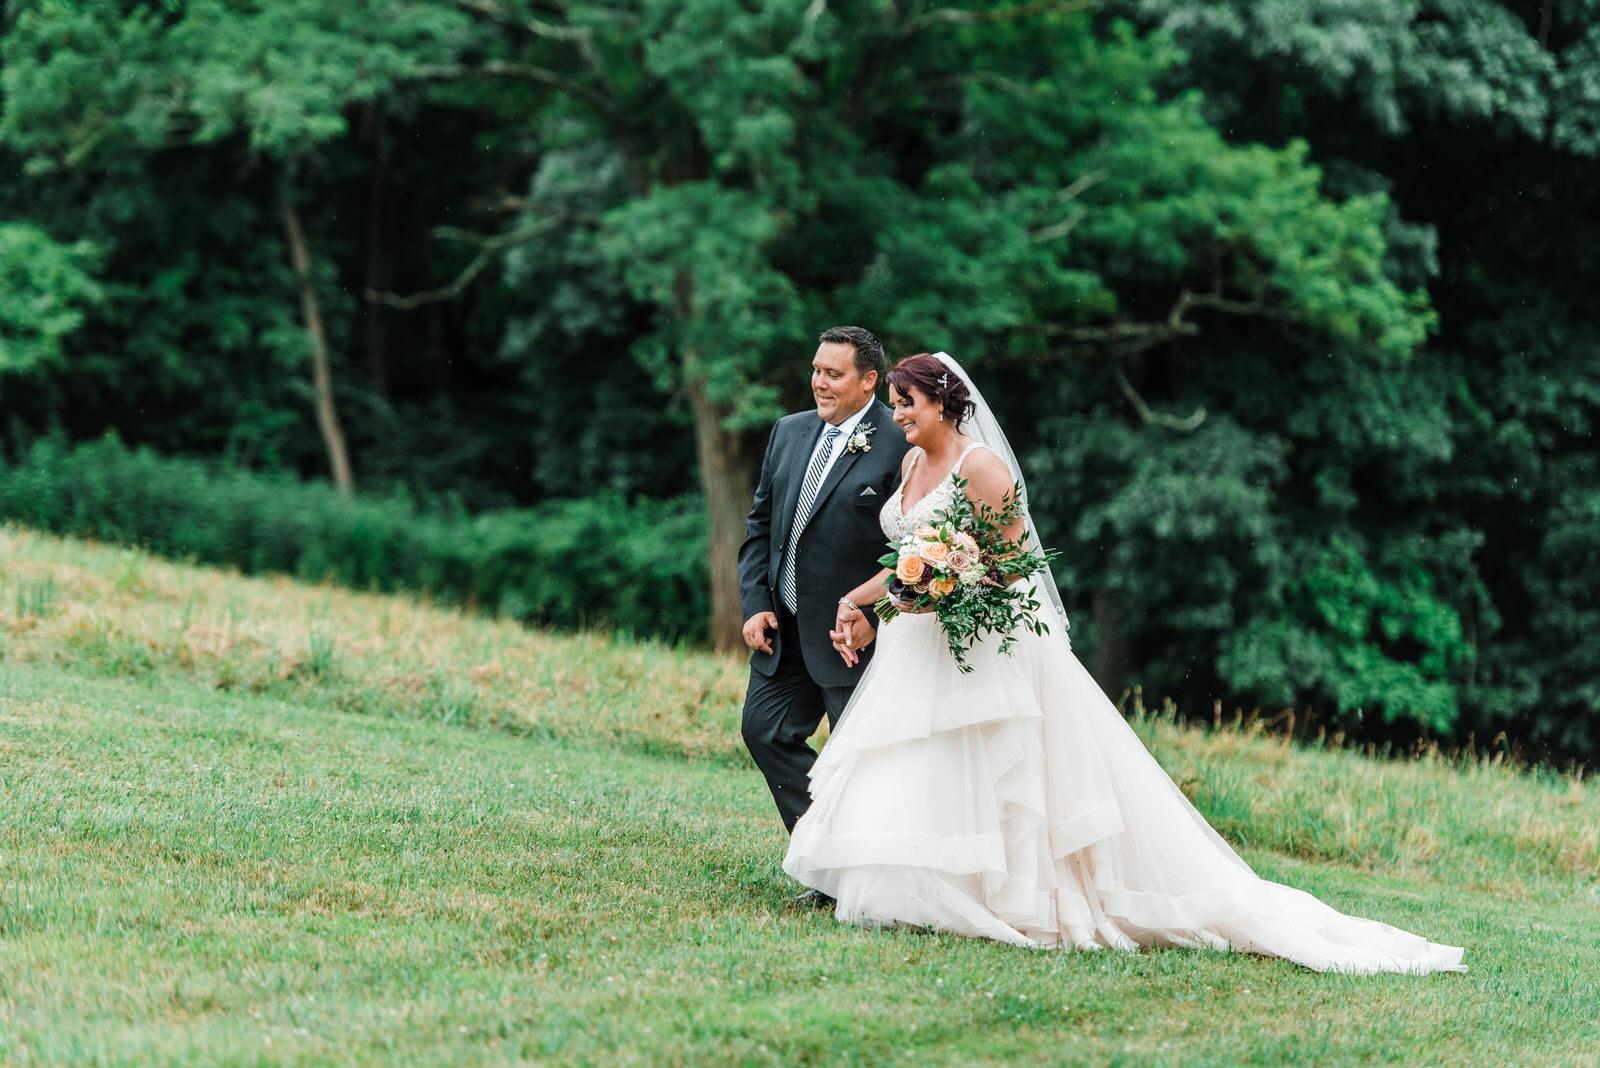 destiny-hill-farm-wedding-photography-1.jpg